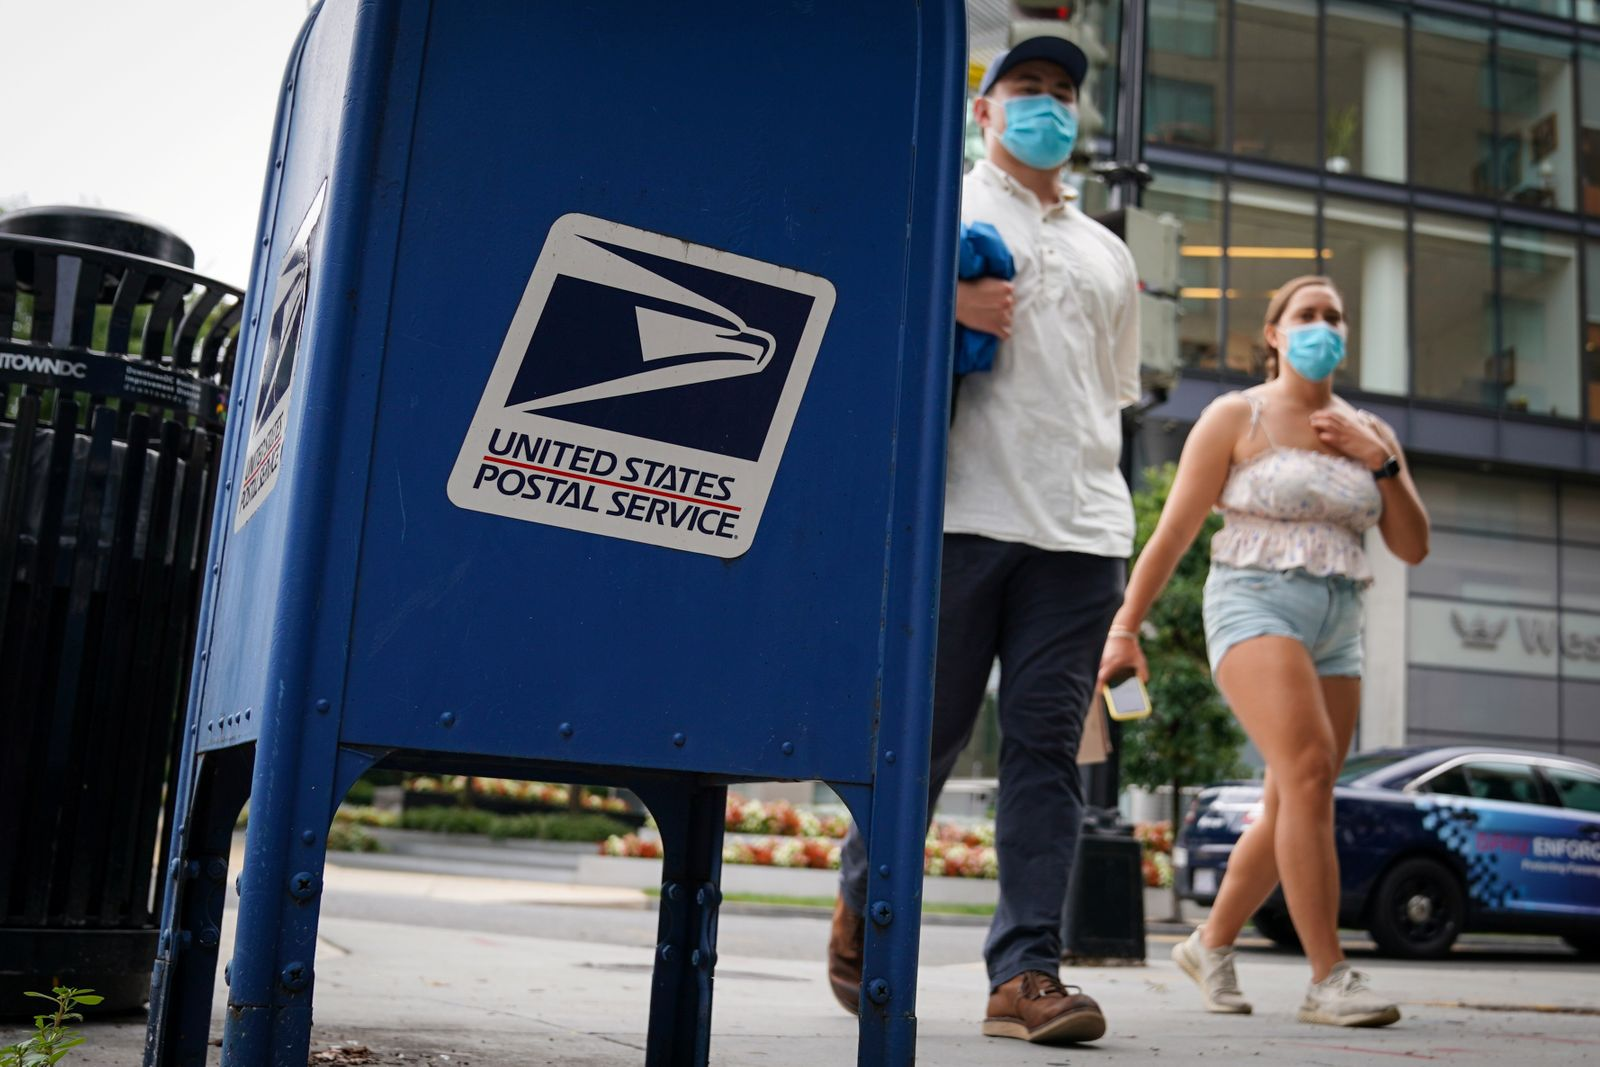 Stimulus Bill Negotiations Stall on Postal Service Funding